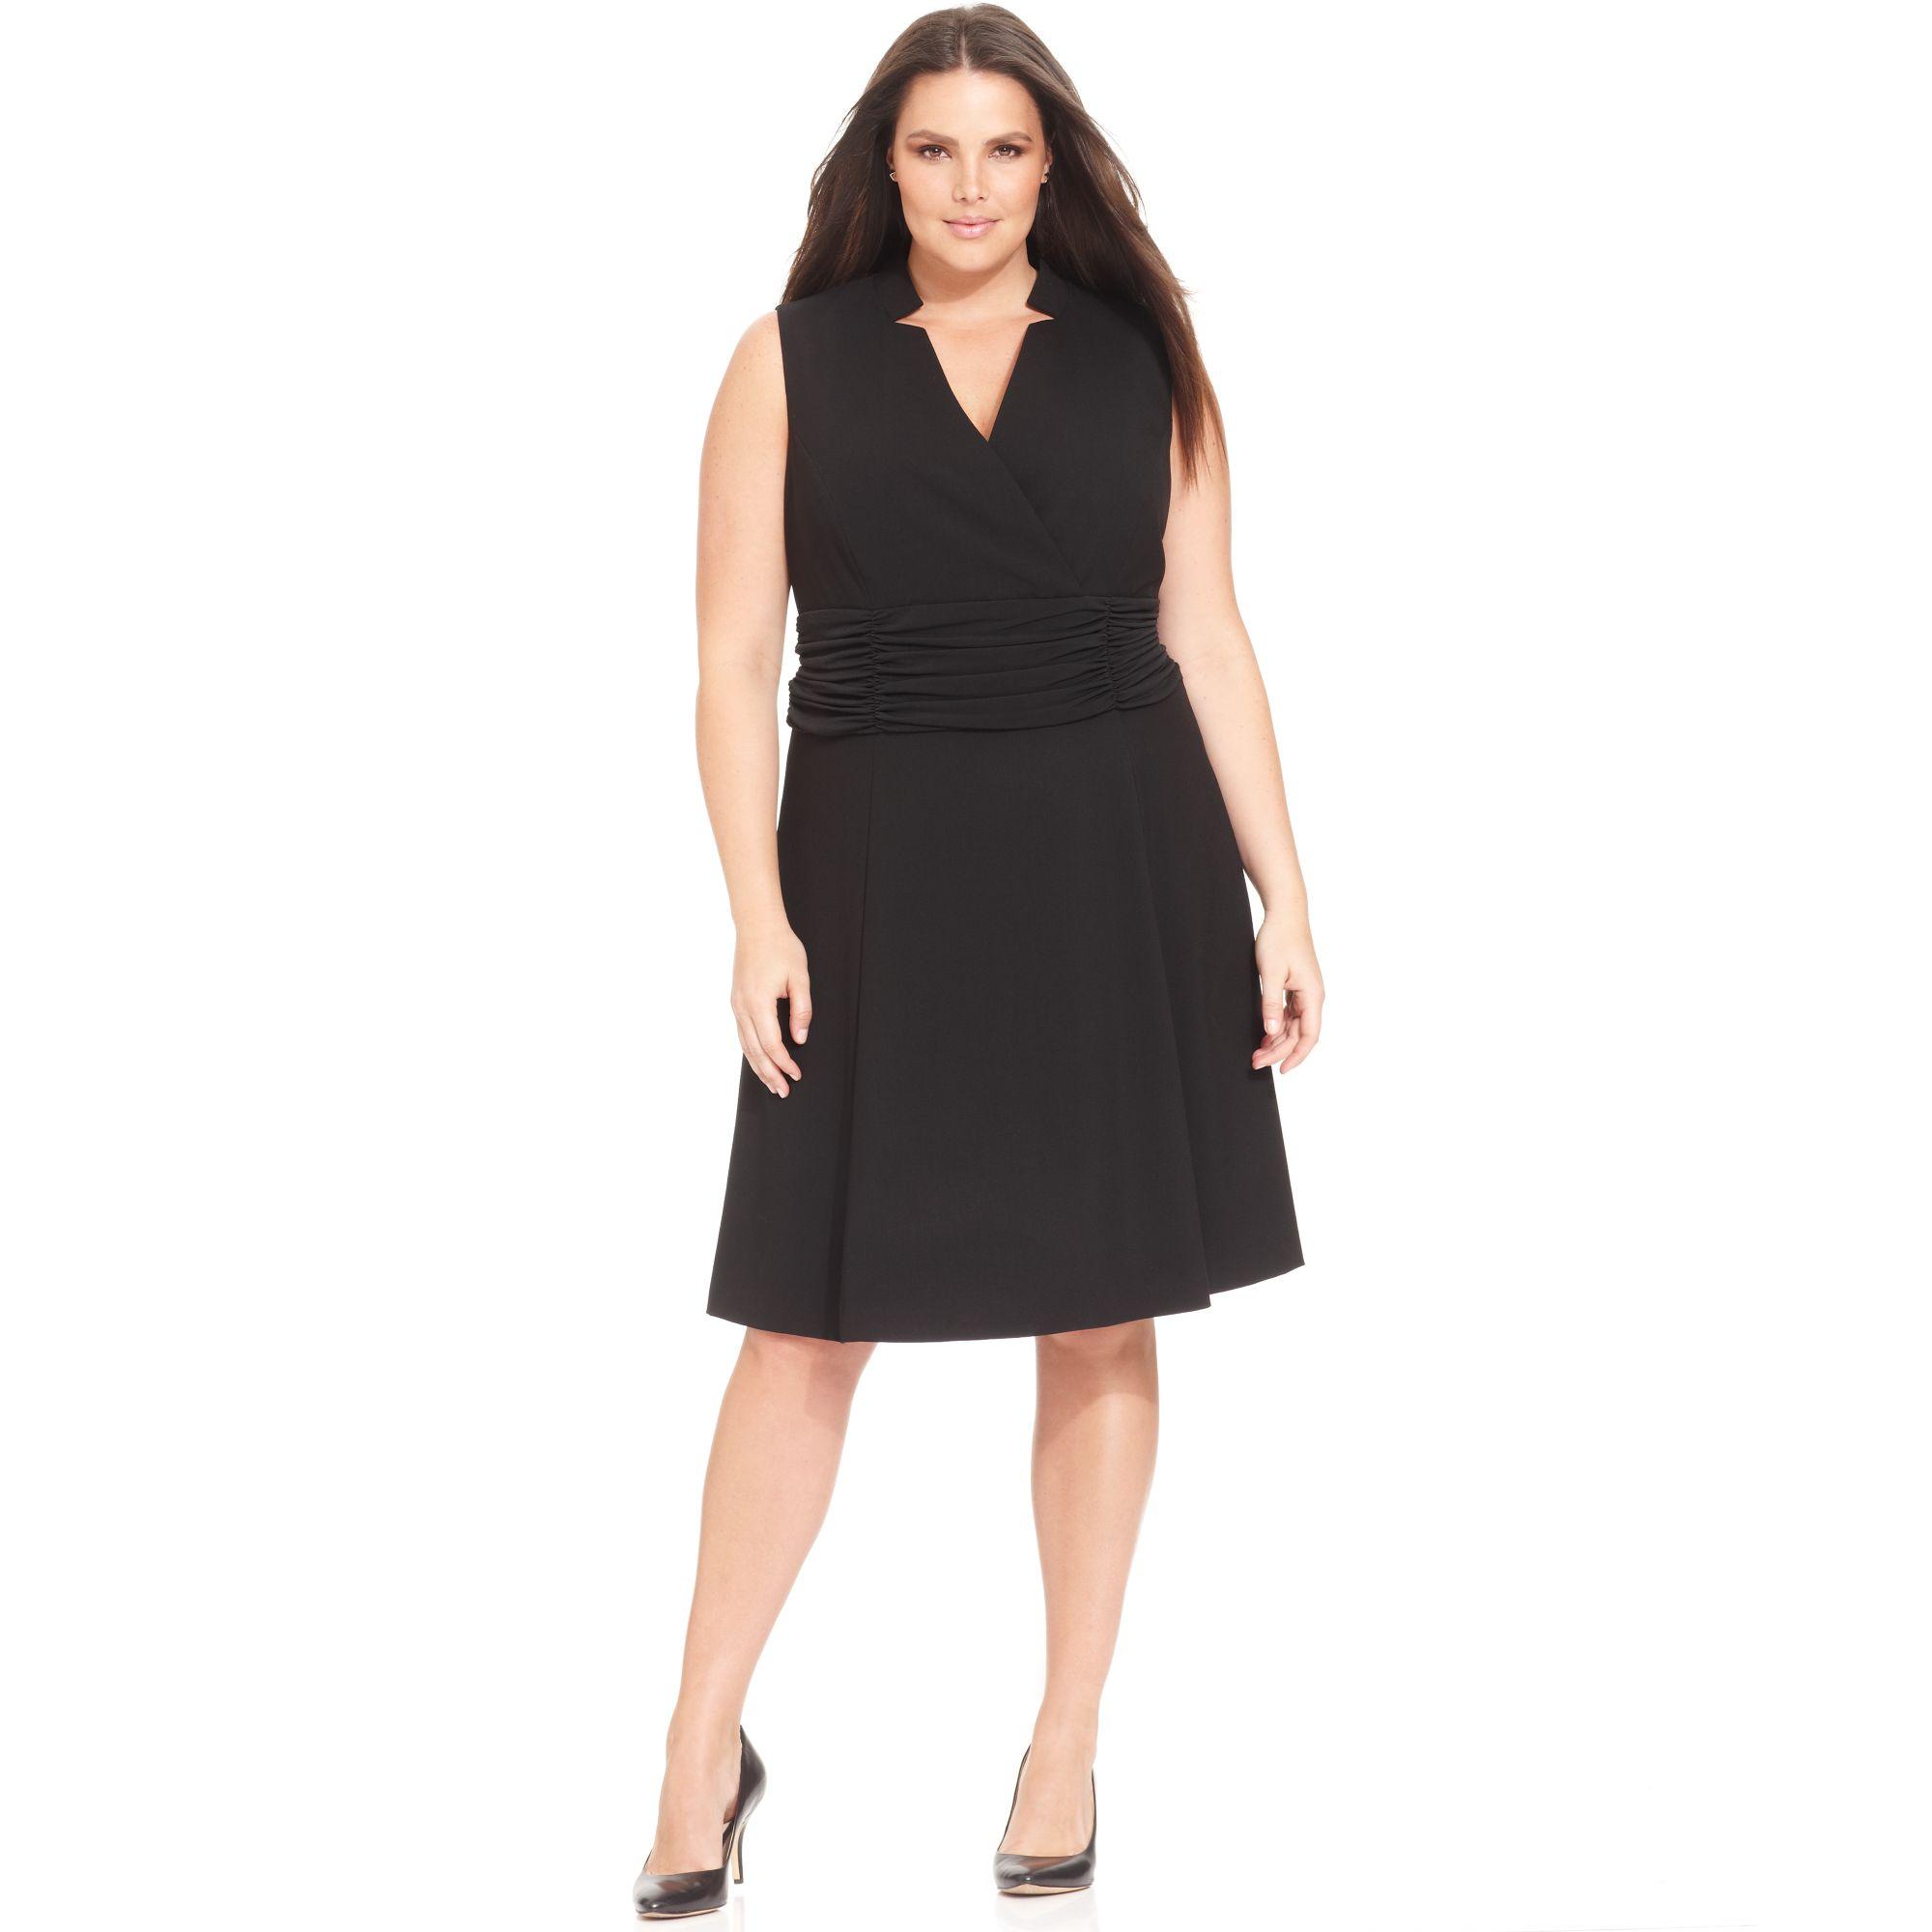 Calvin klein plus size dresses black